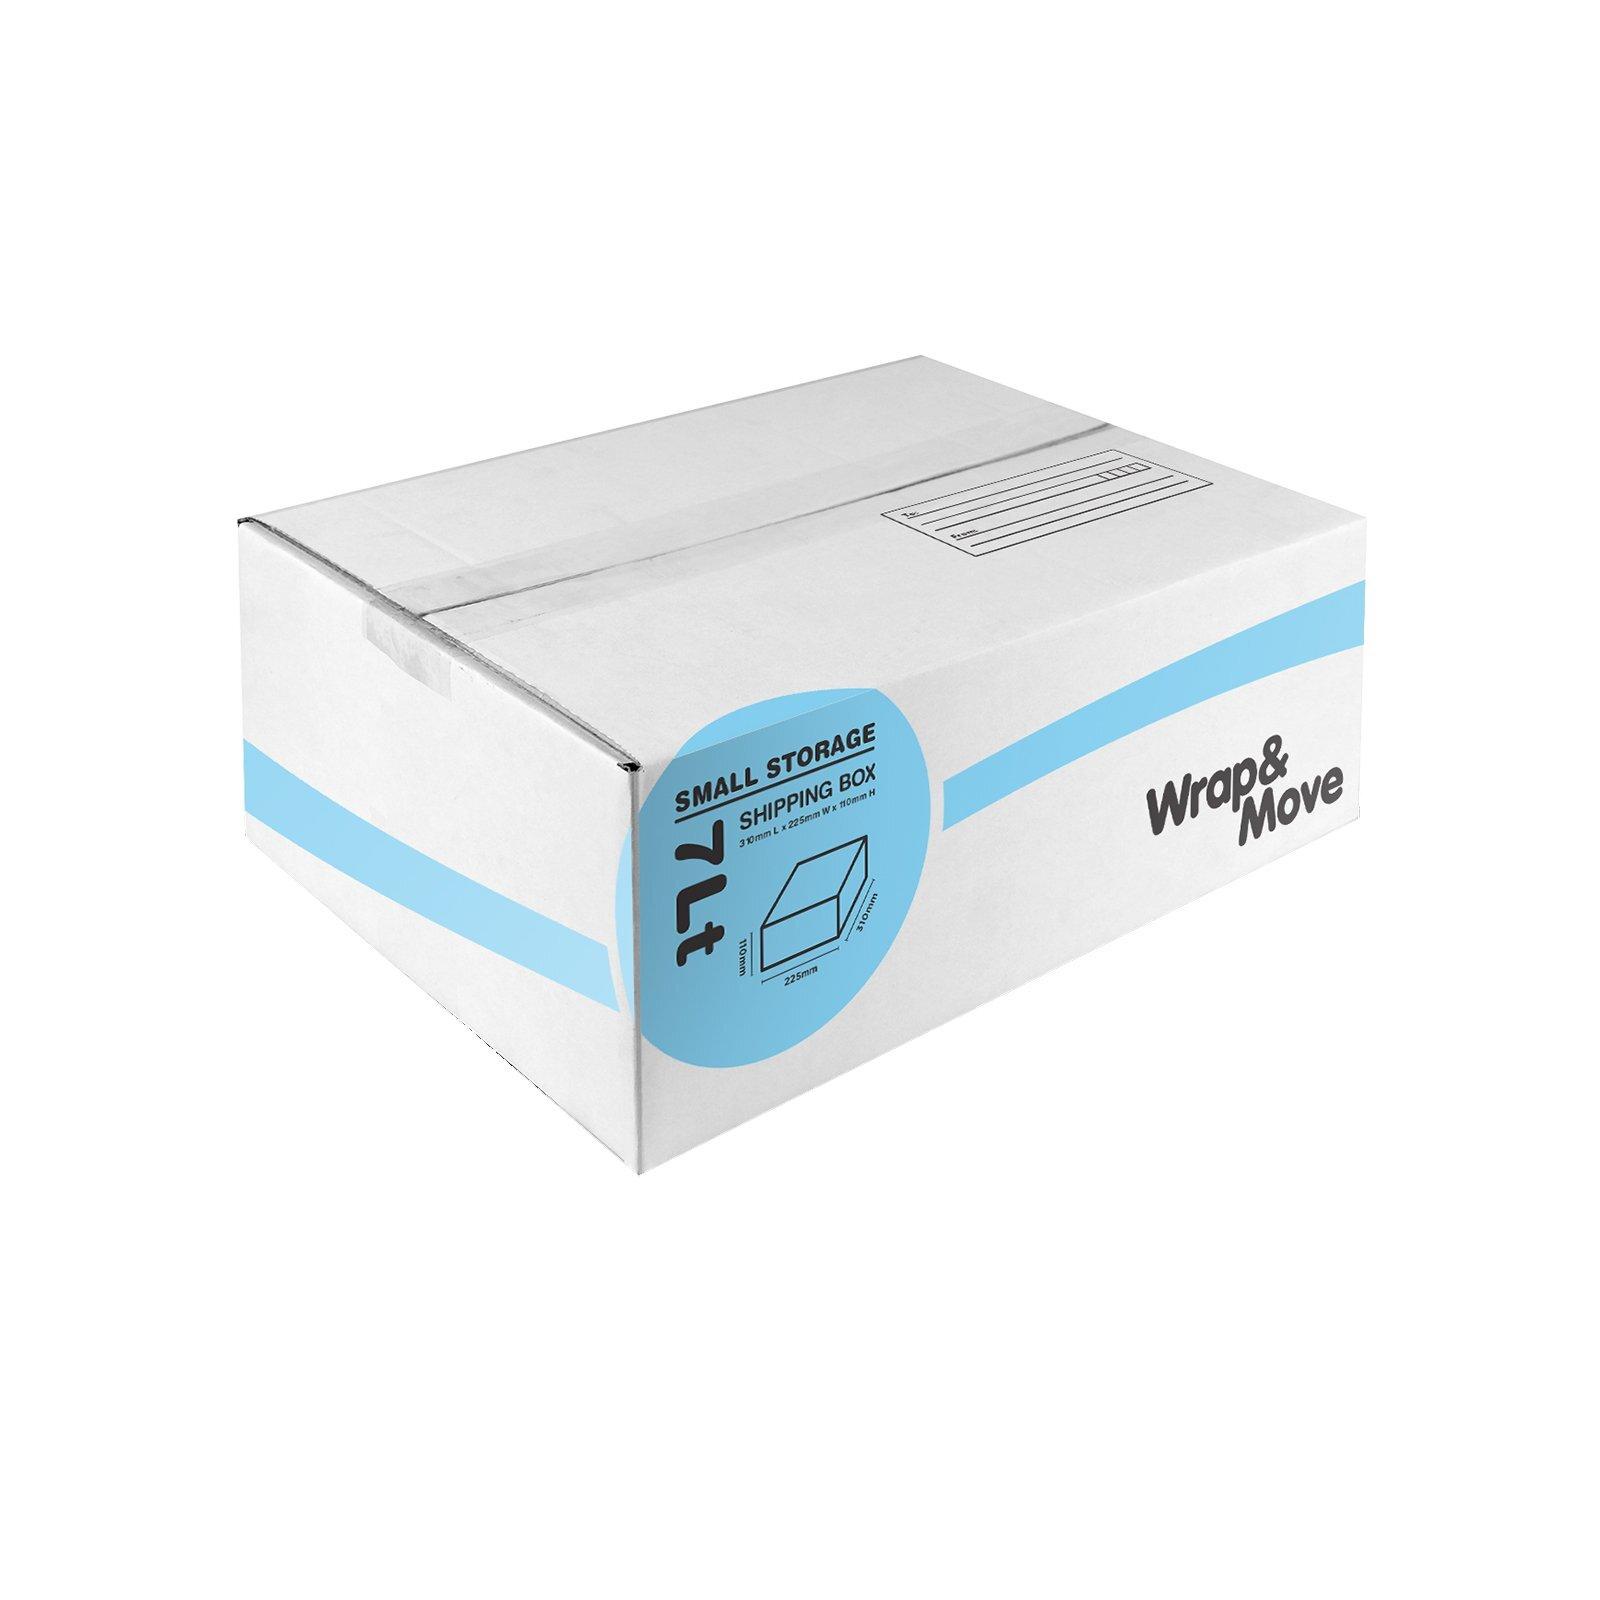 Wrap & Move 310 x 225 x 110mm 7L Small Mailing Box